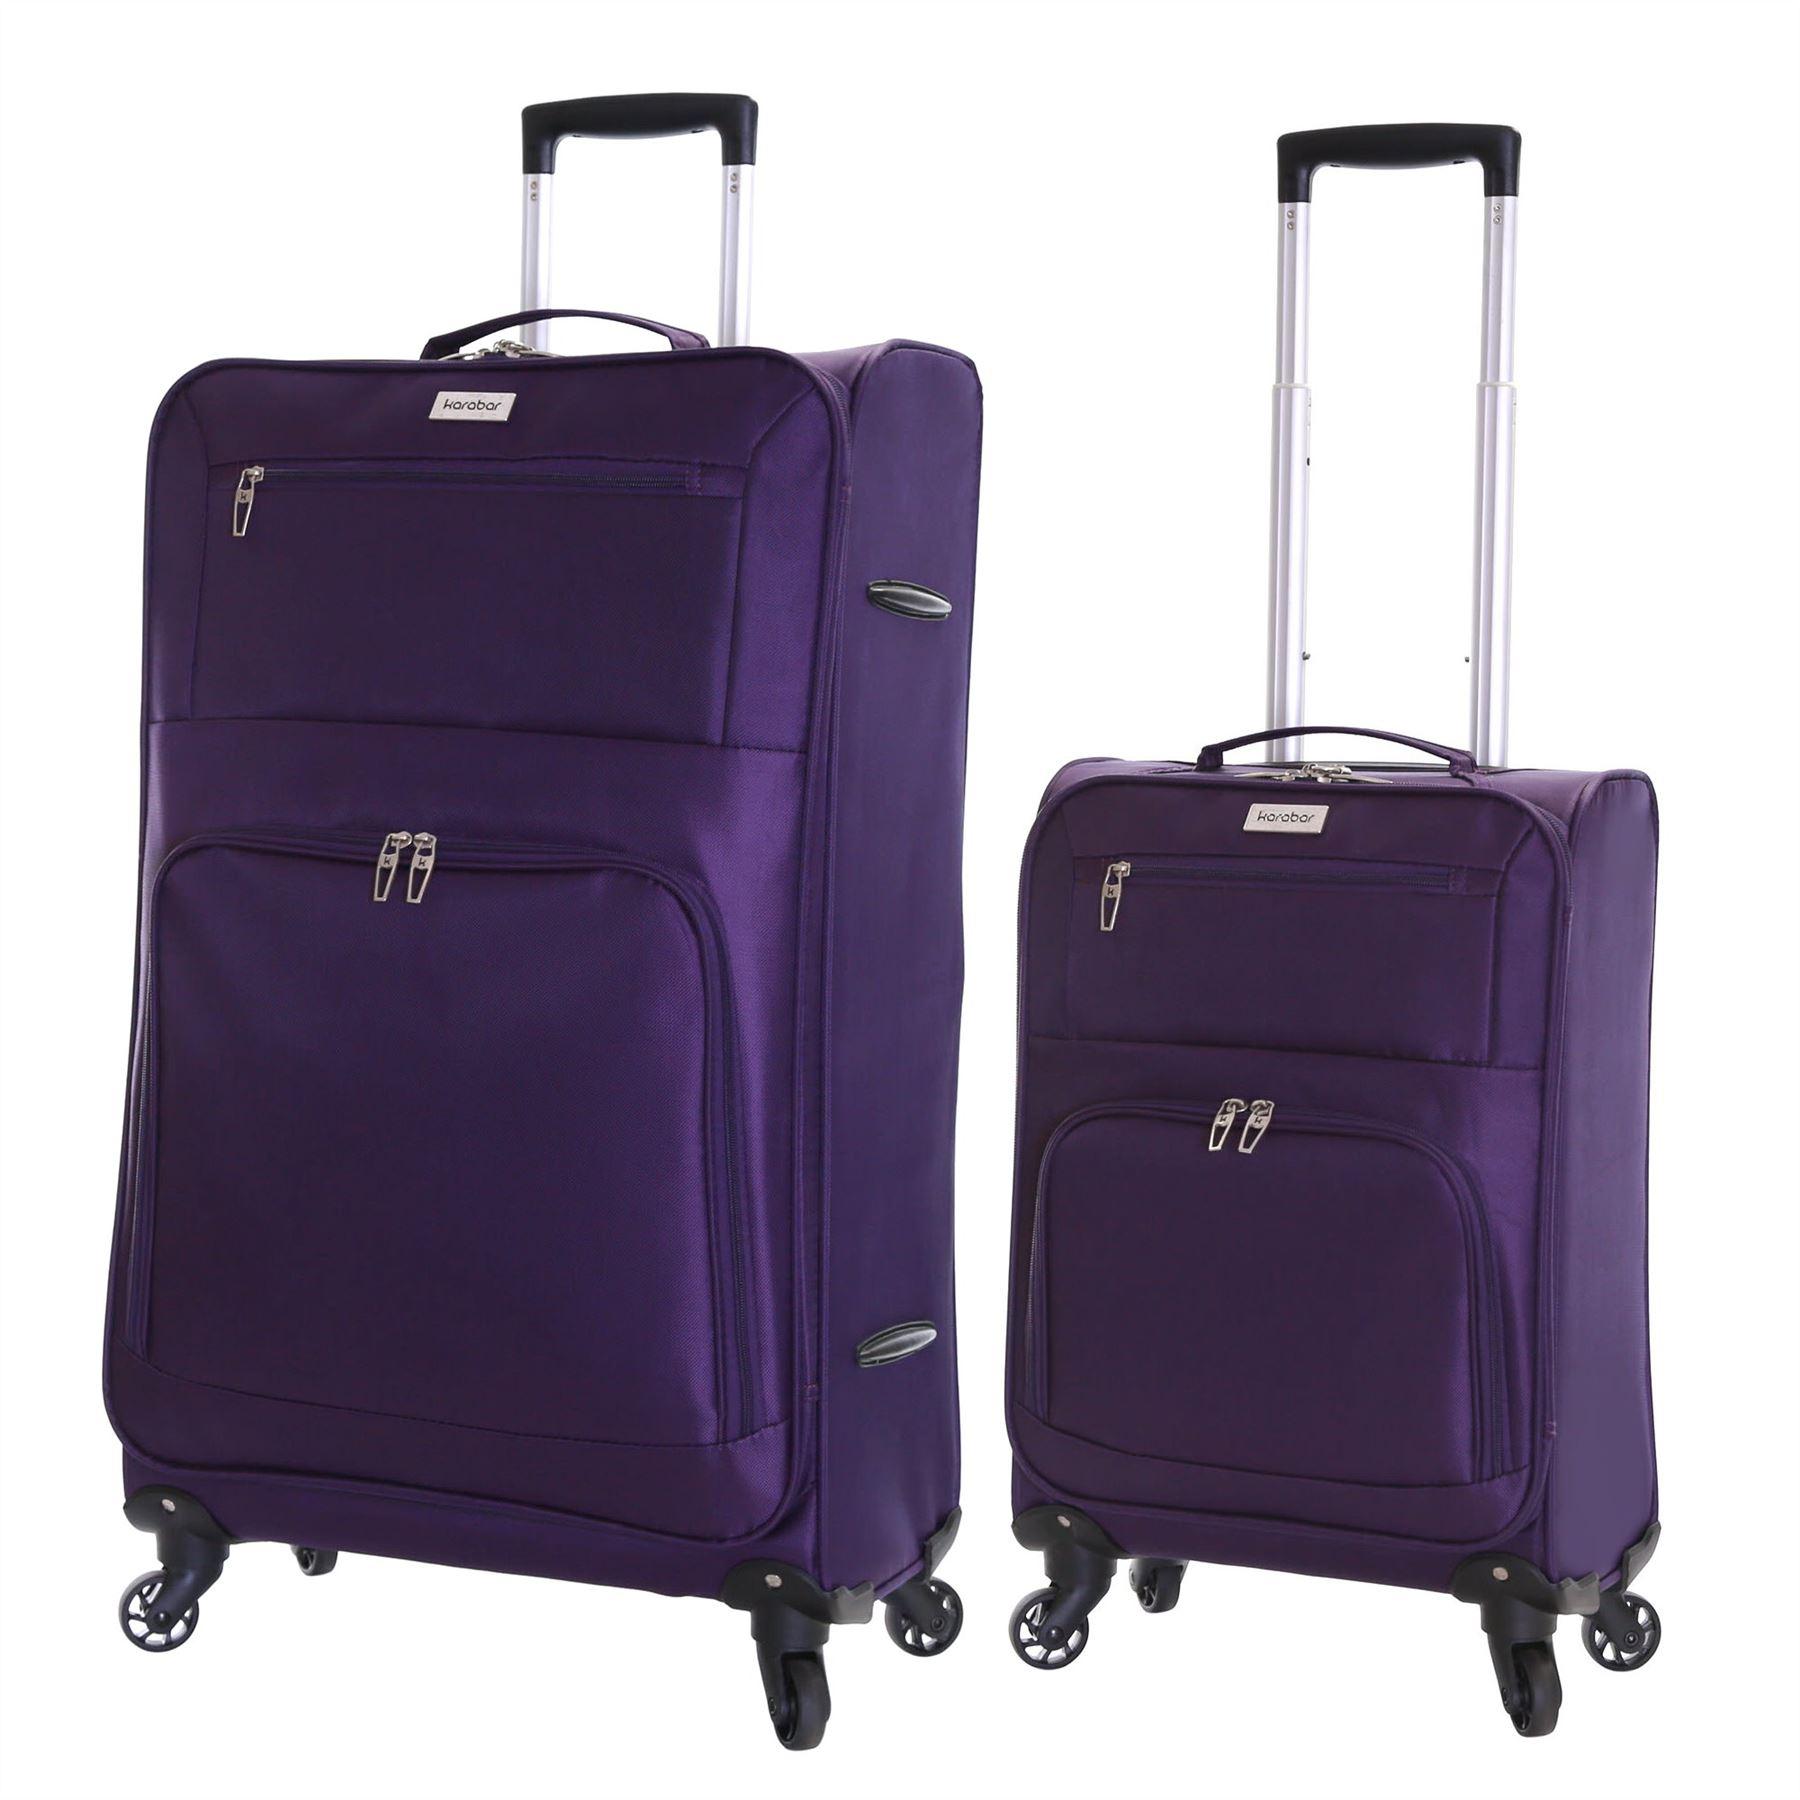 Set of 2 Ultra Lightweight 4 Wheeled Travel Luggage Trolleys ...